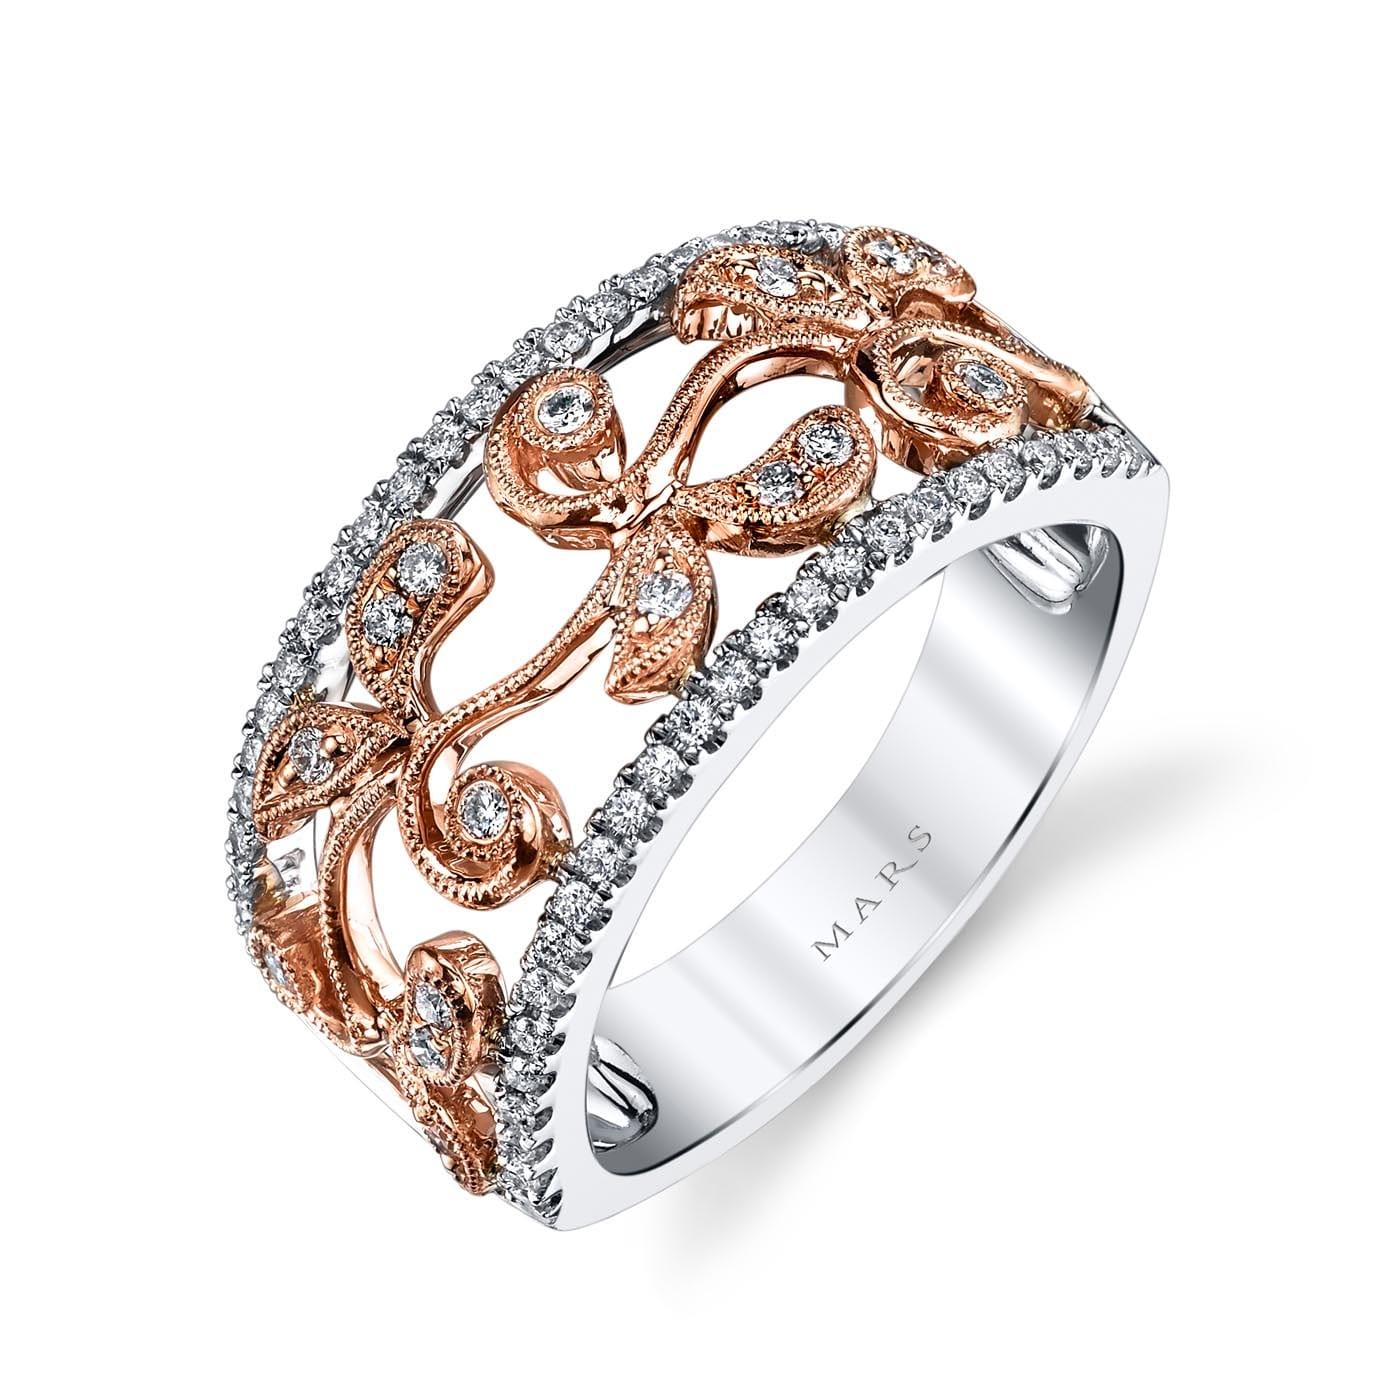 Diamond Ring - Fashion Band Style #: MARS-26753